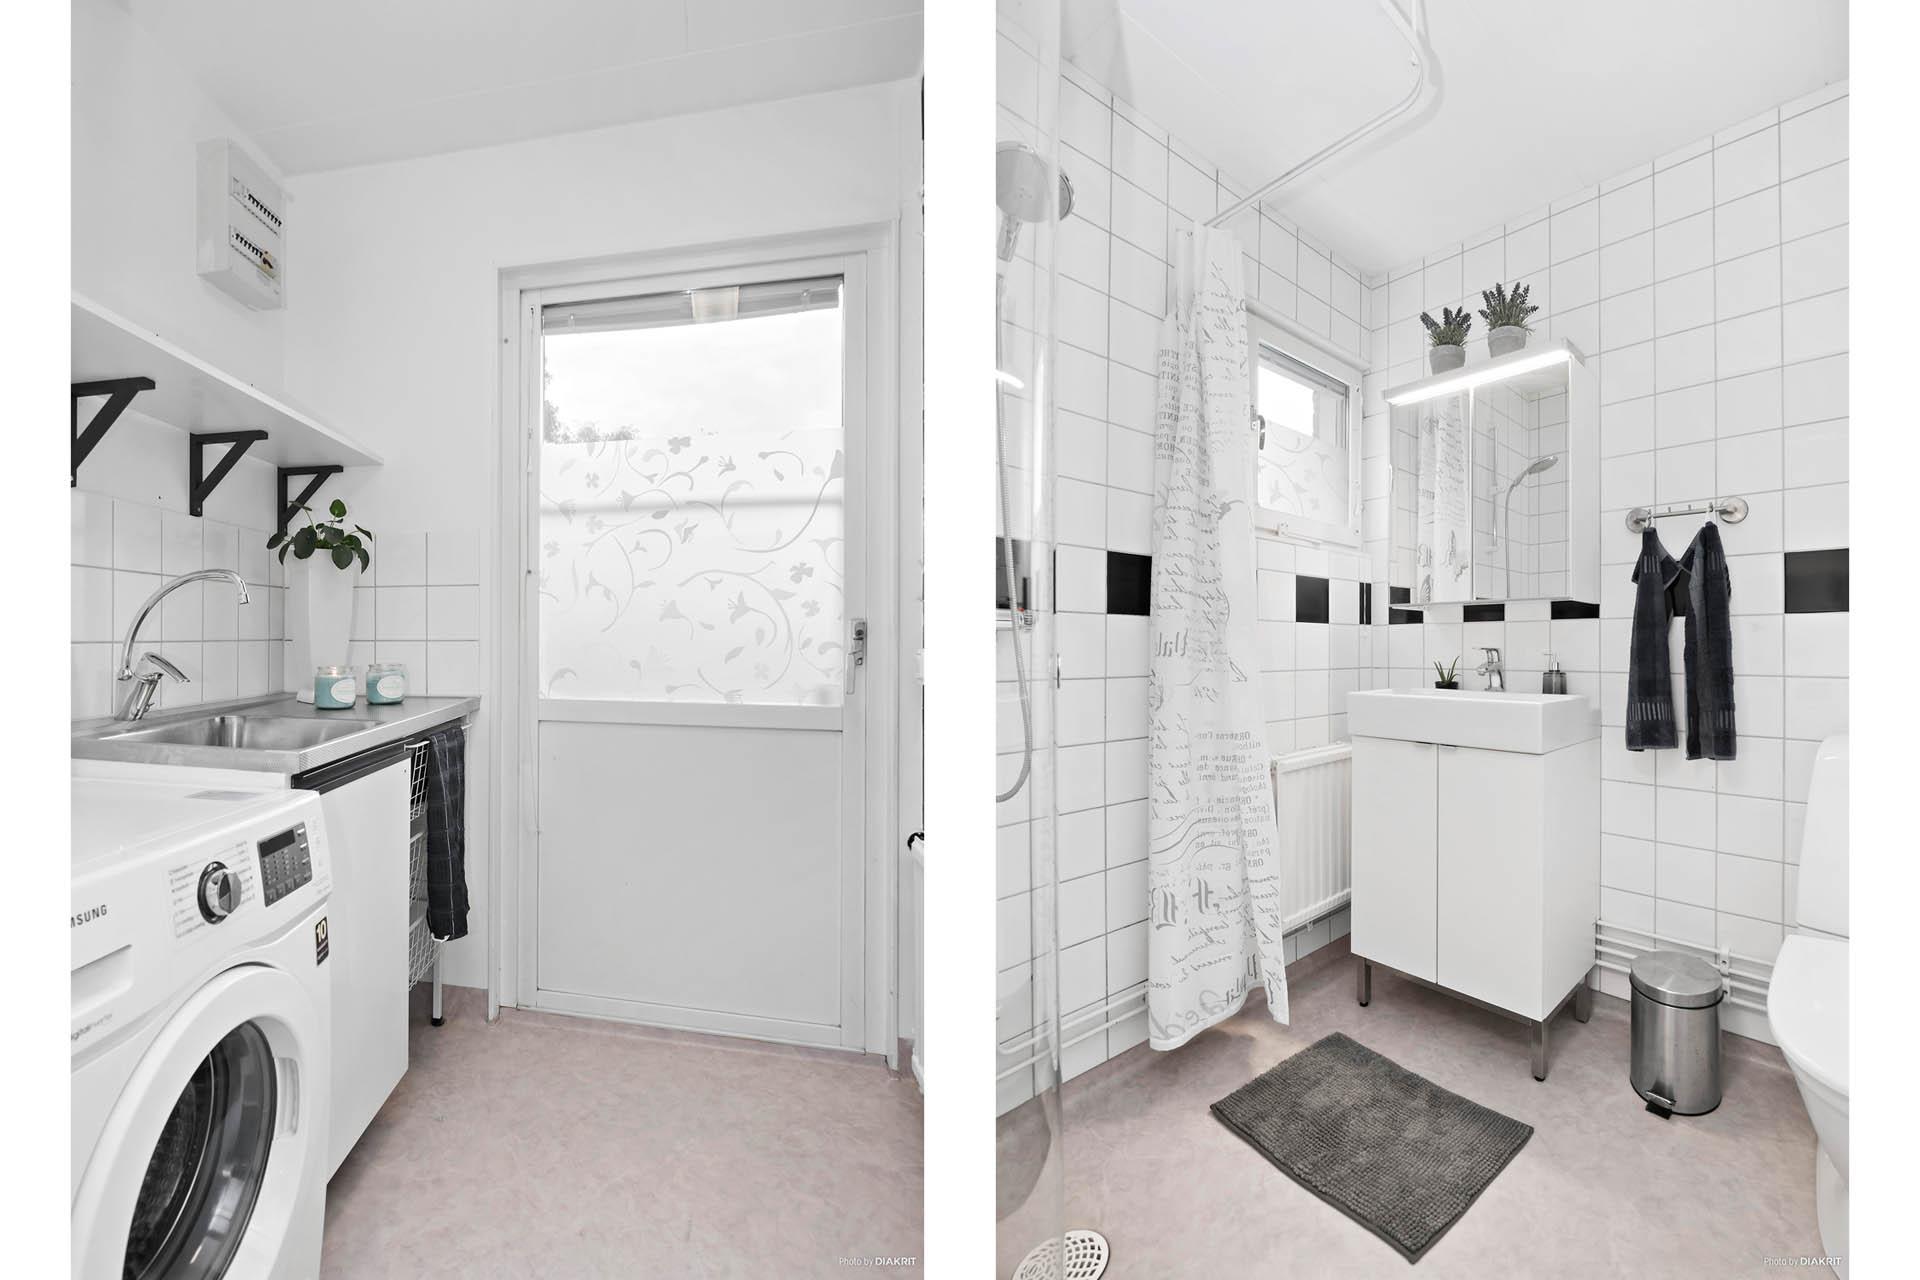 Groventré/tvättstuga ihop med badrum